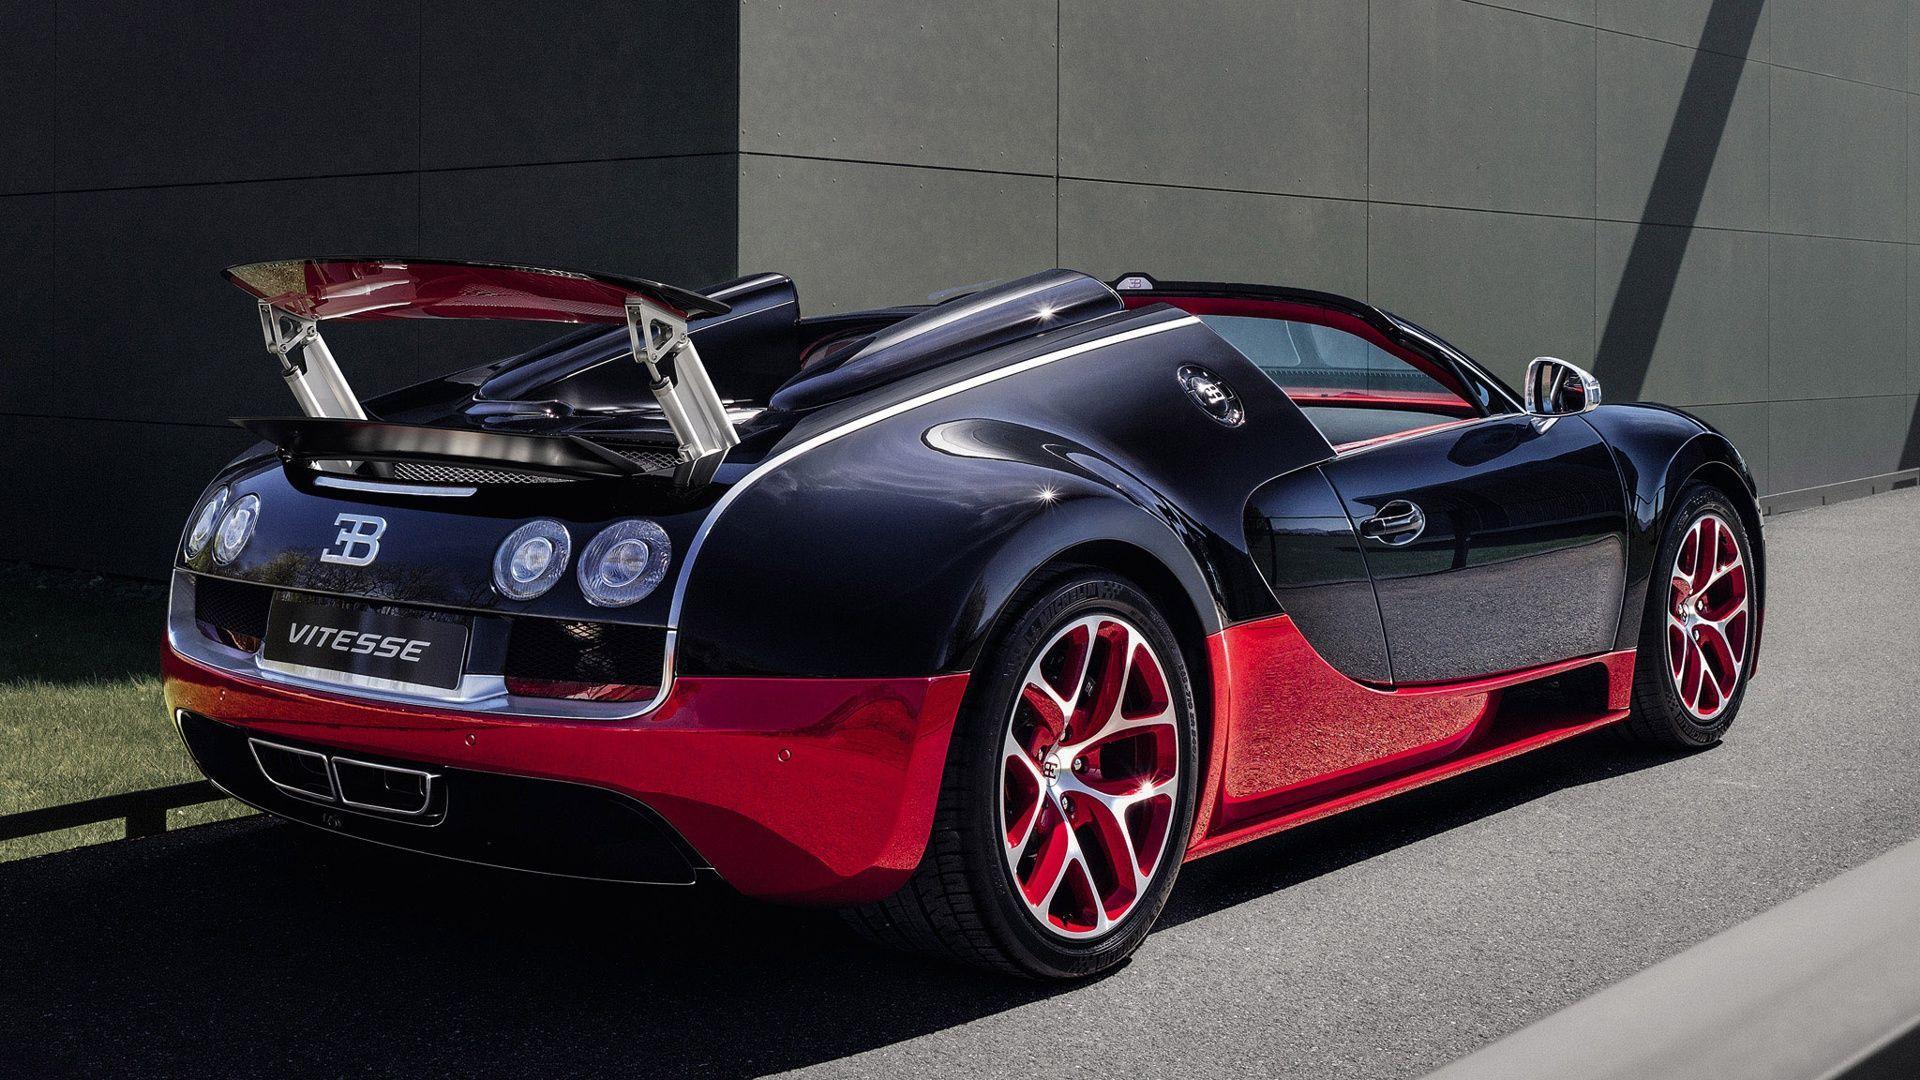 Bugatti Veyron Super Sport Gold Wallpaper: Gold Bugatti Veyron Car Wallpapers